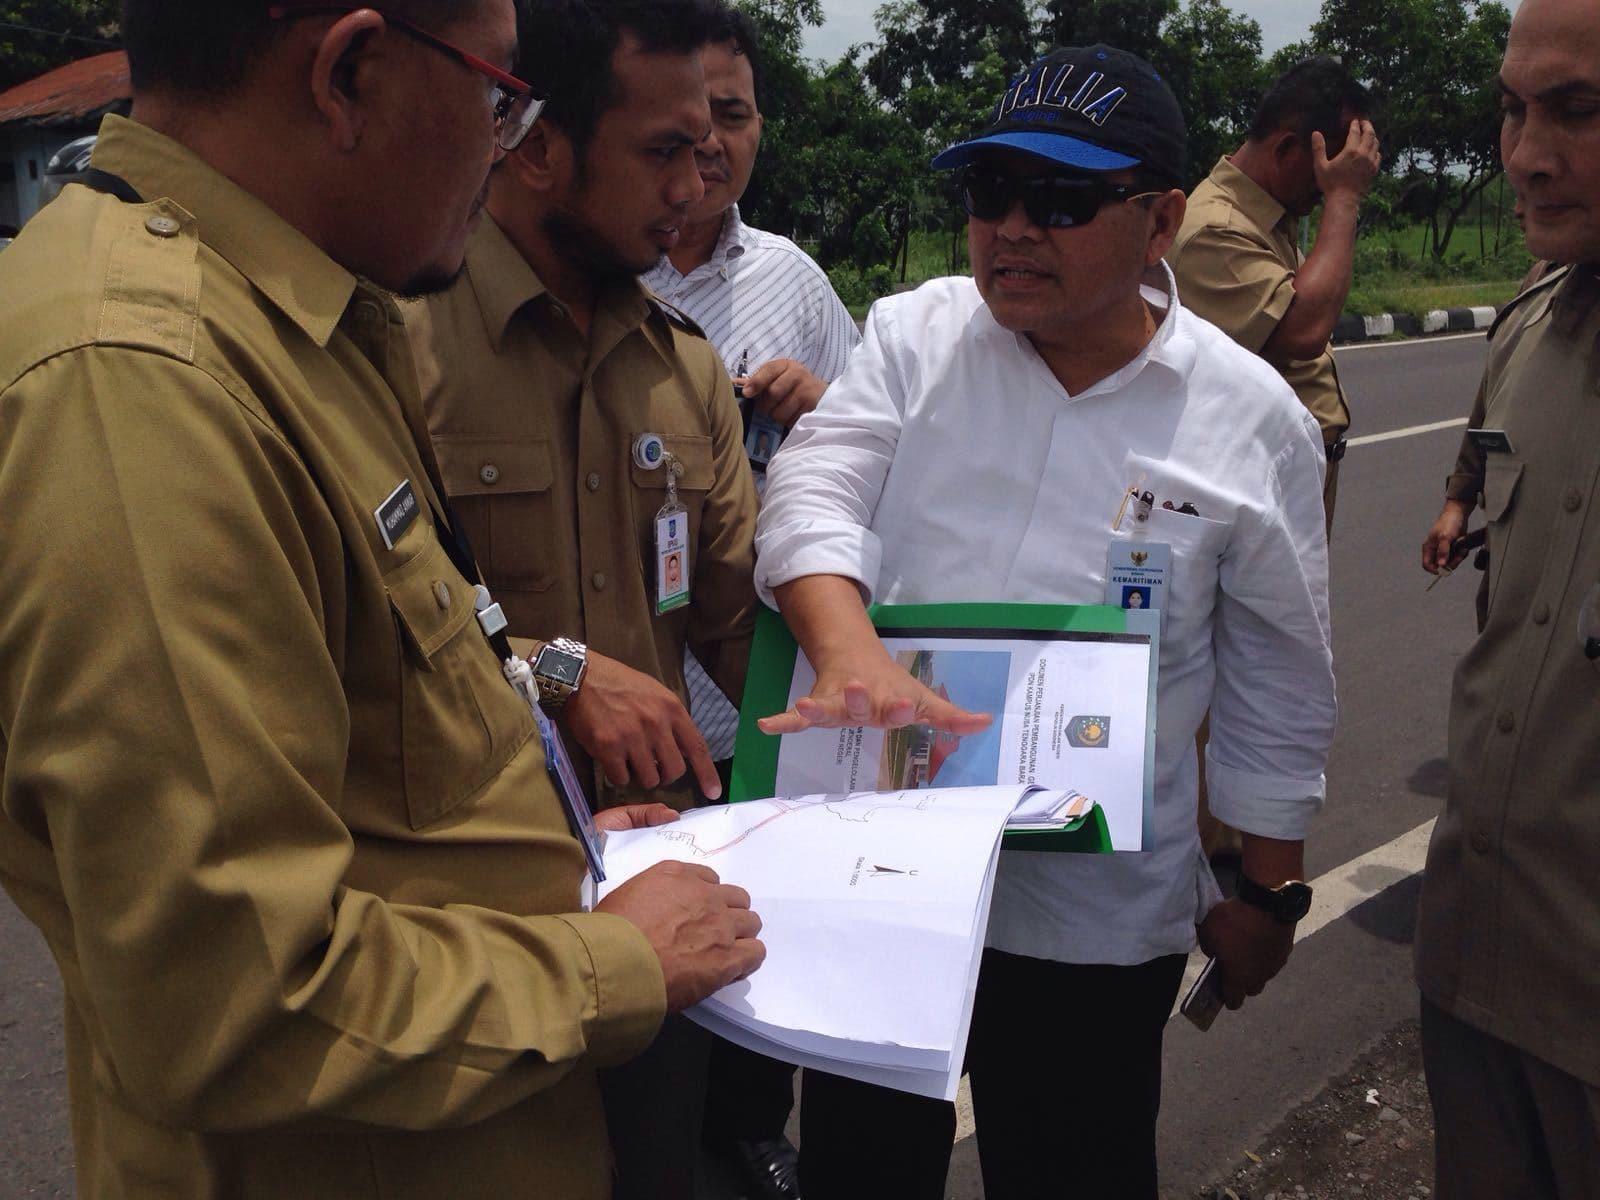 Safri Tinjau Lokasi Pembangunan STP Mandalika